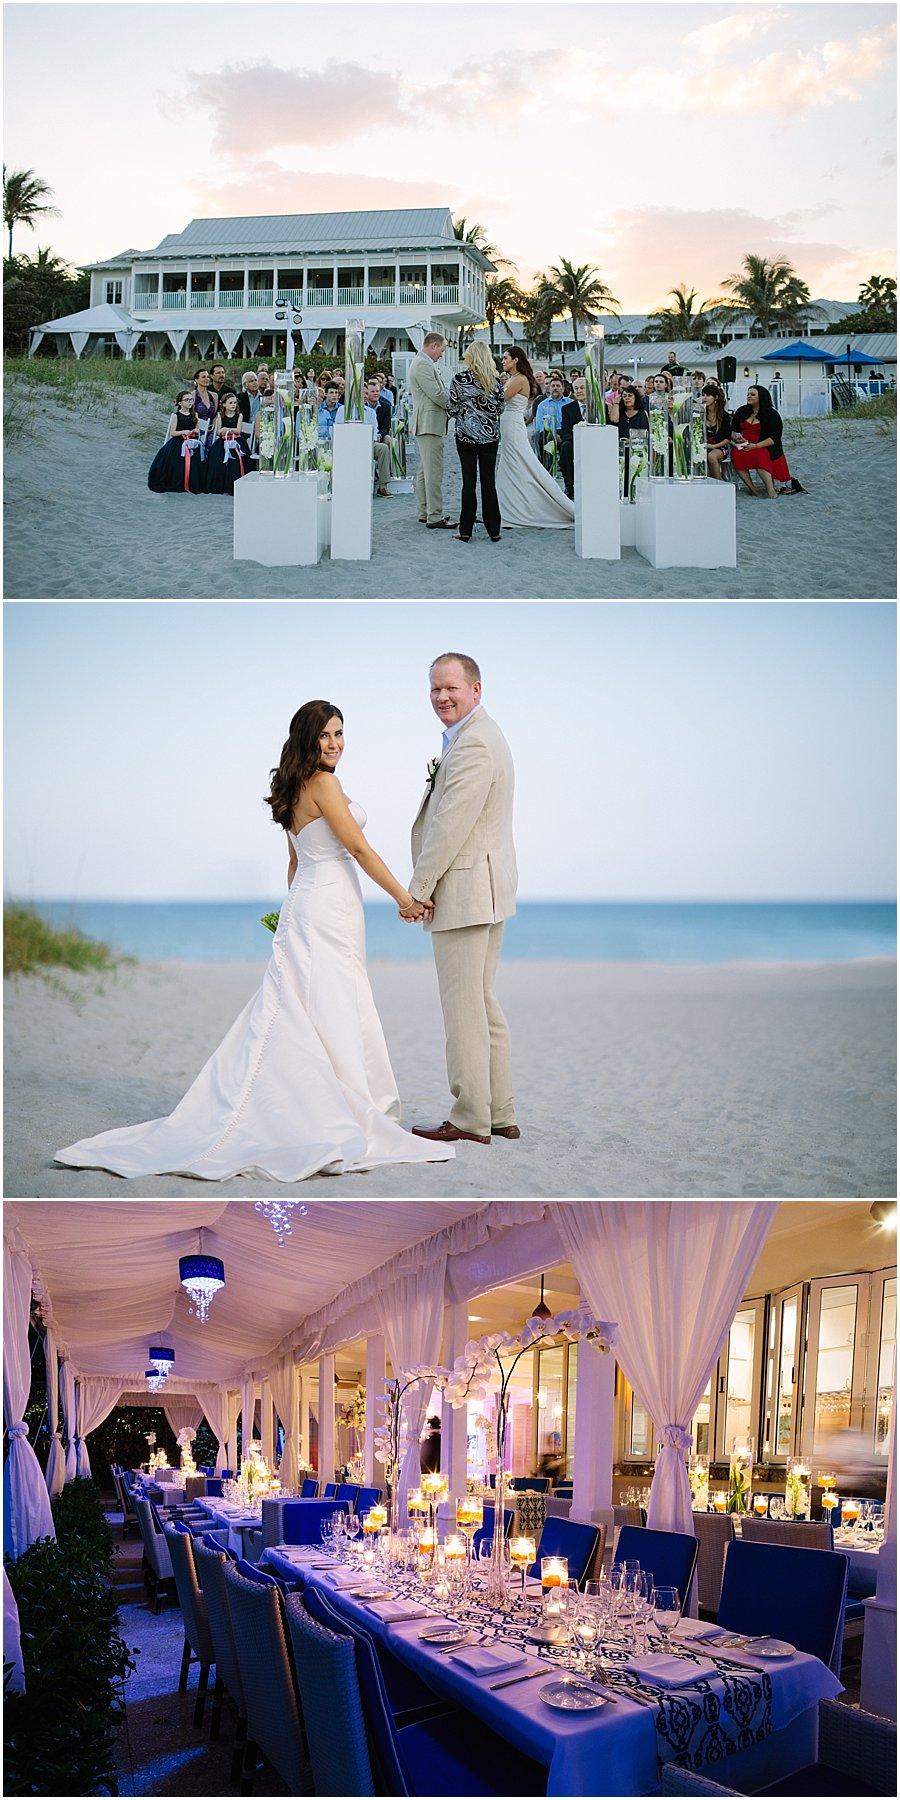 Seagate Hotel And Beach Club Delray Wedding Venues